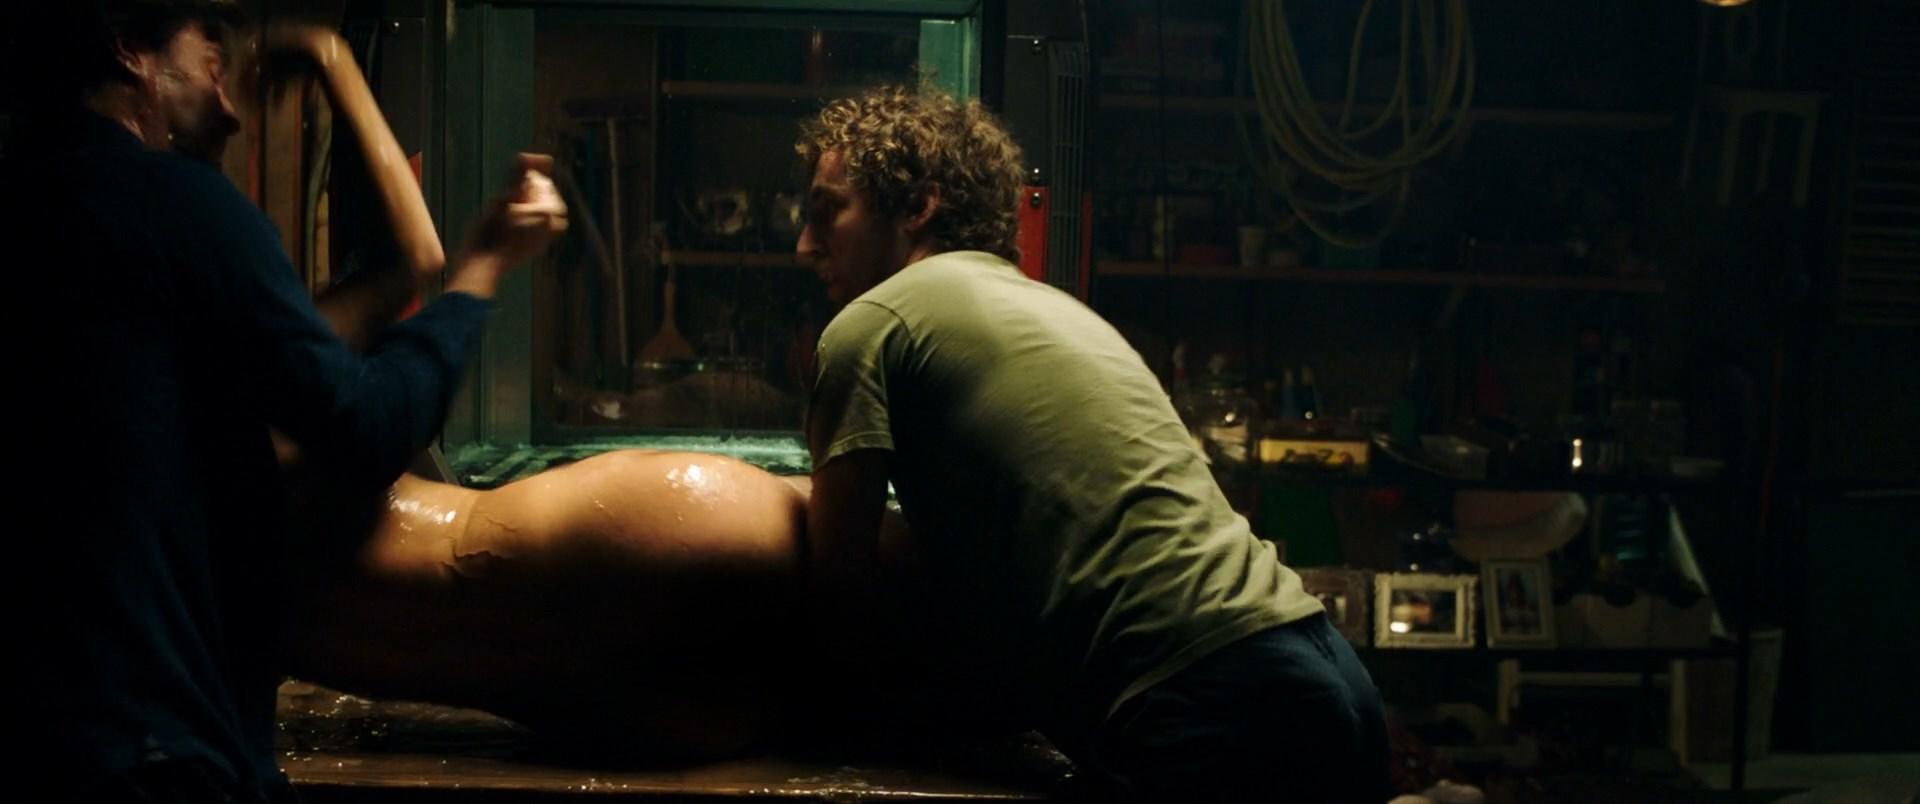 Ella scott lynch nude sex scene on scandalplanetcom - 2 part 5